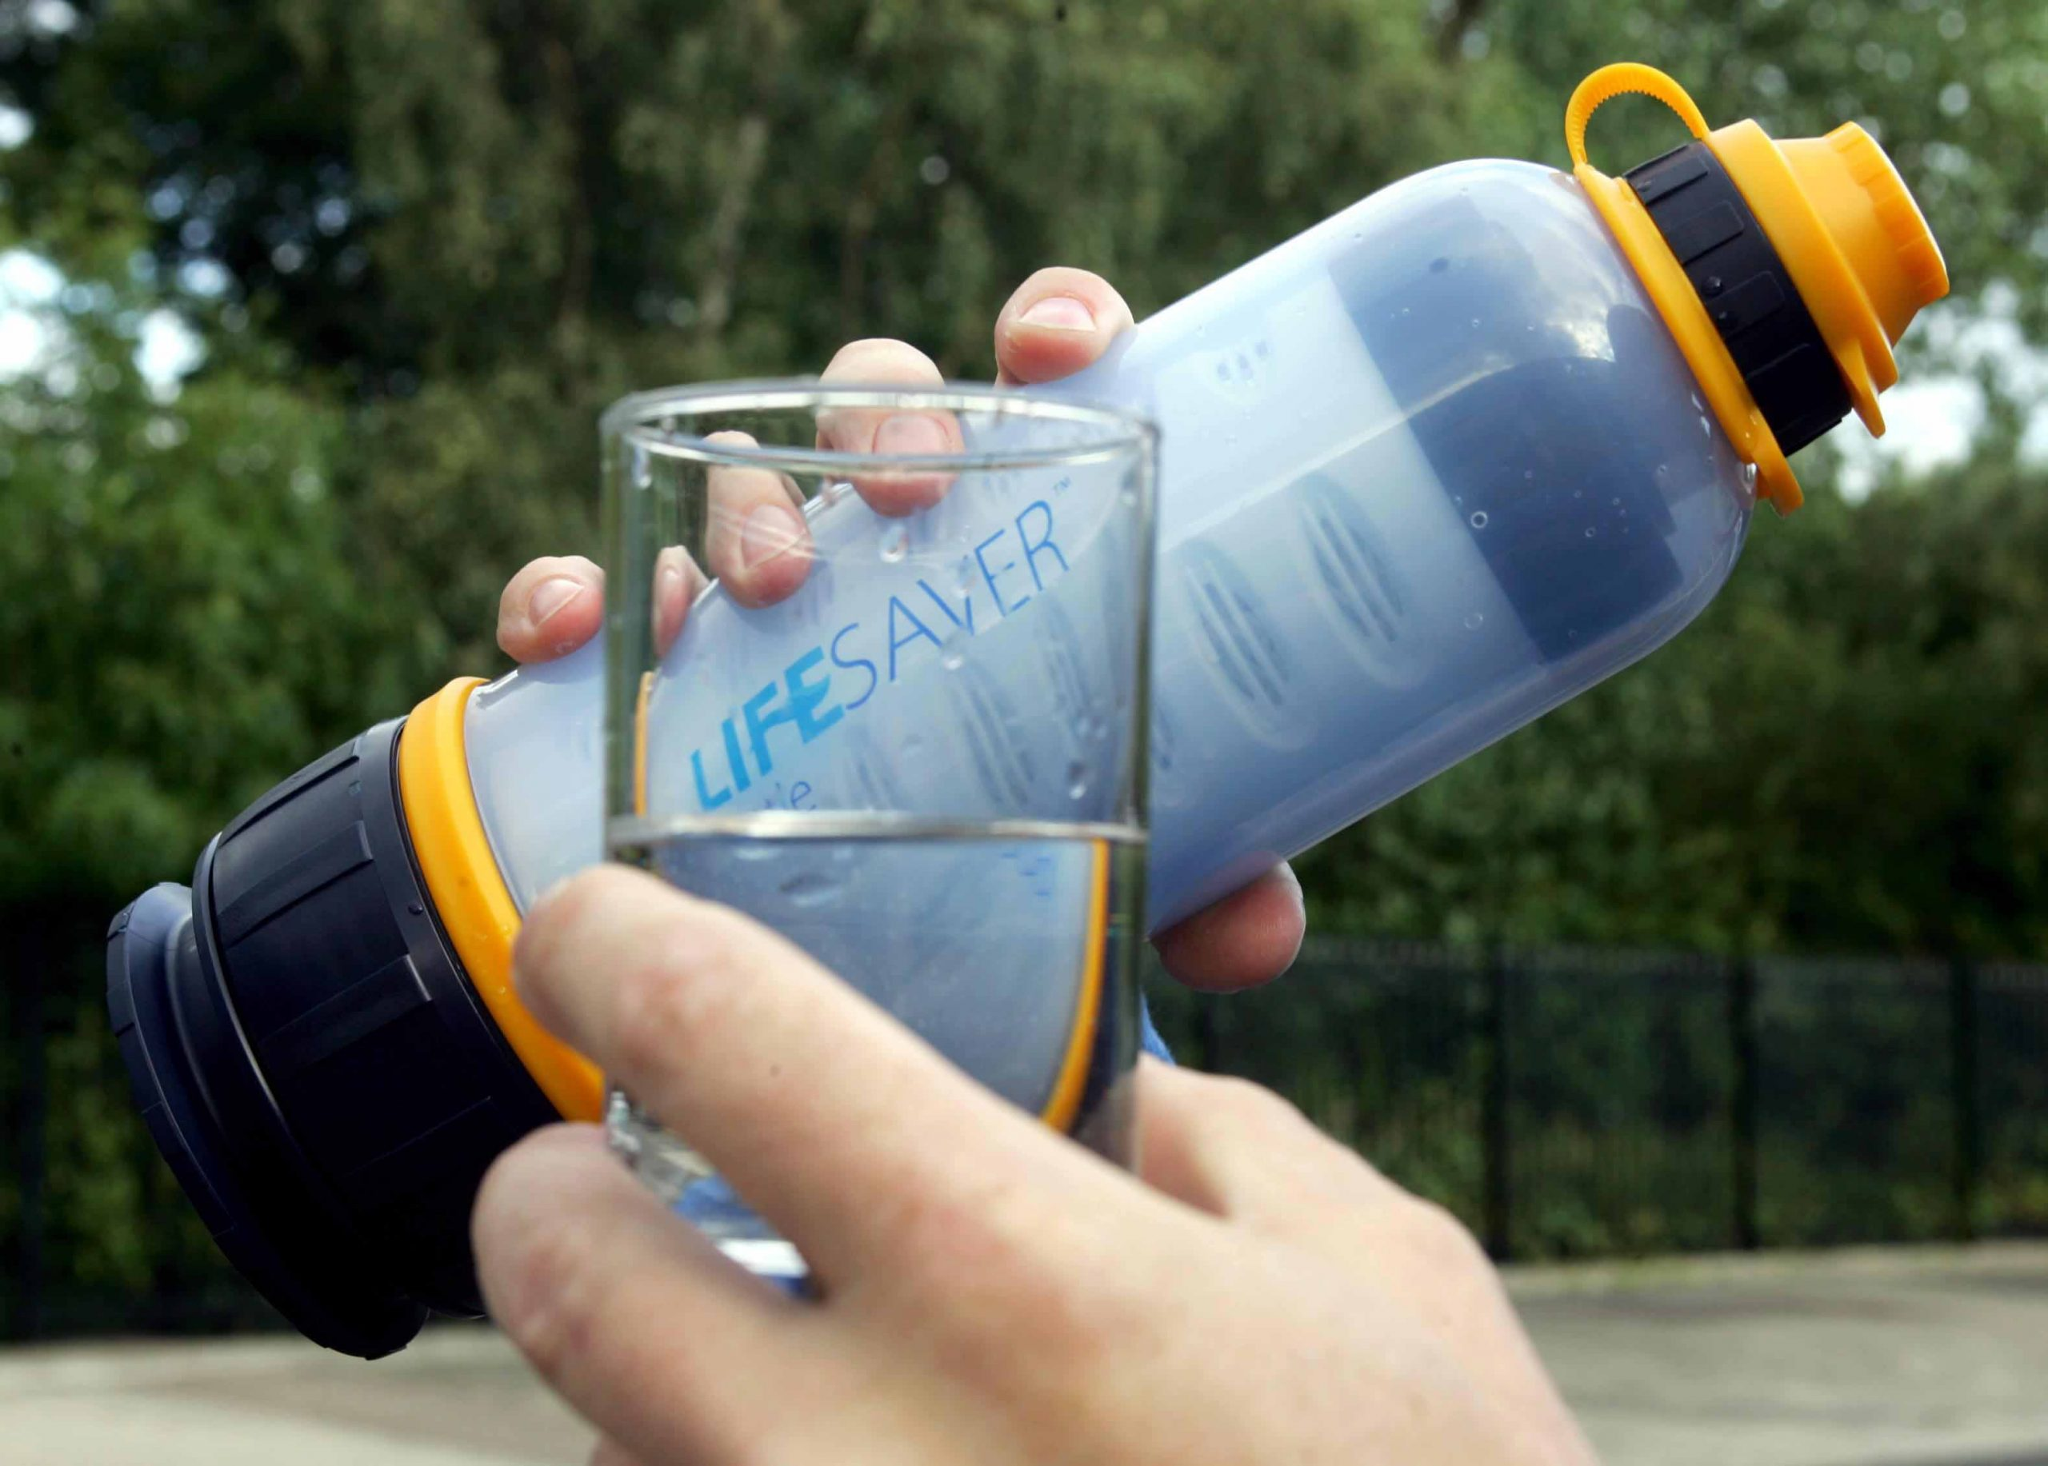 Revolucionario filtro portátil para potabilizar agua